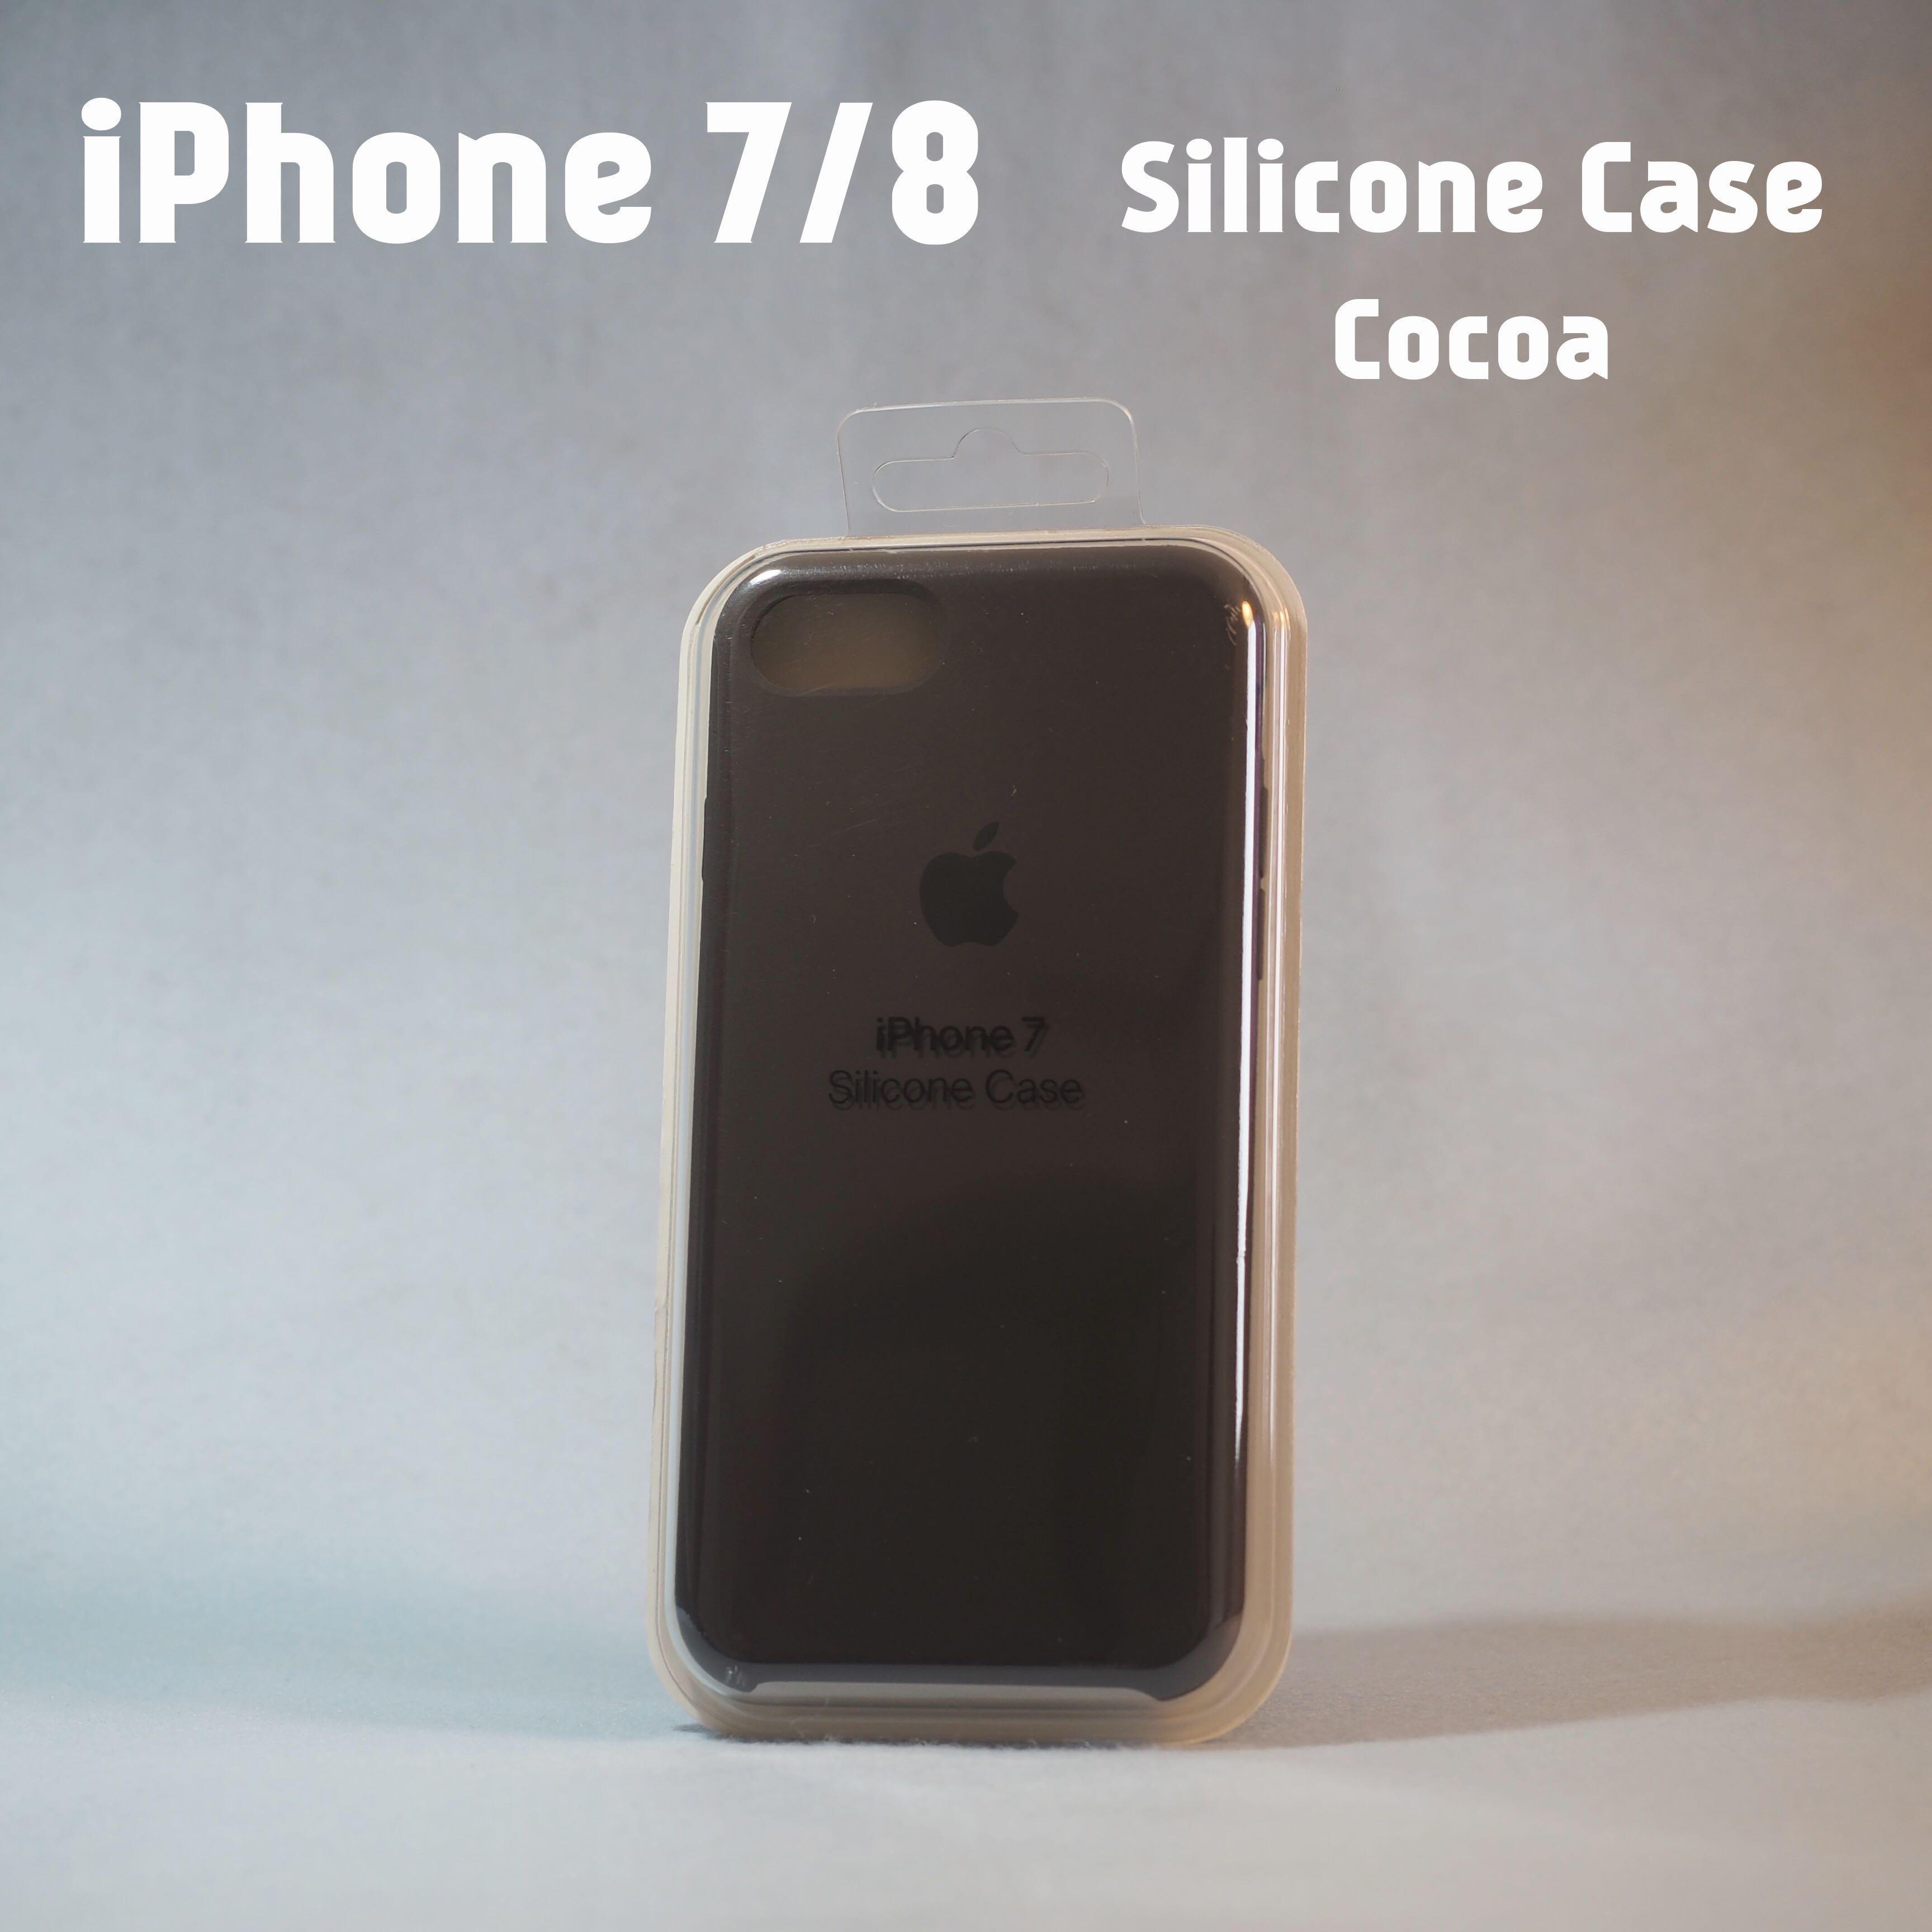 quality design a8d5e 8eda1 iPhone 7 / 8 Silicone case (Cocoa)